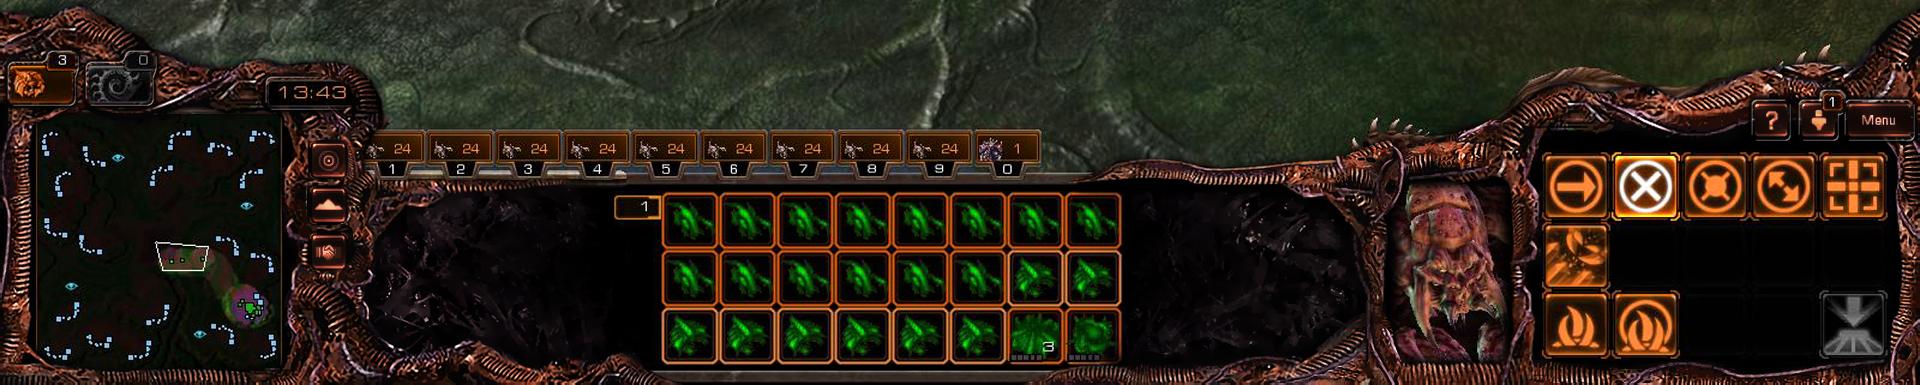 [HOTS] BroodWar Zerg UI overlay skin by Dexistor371